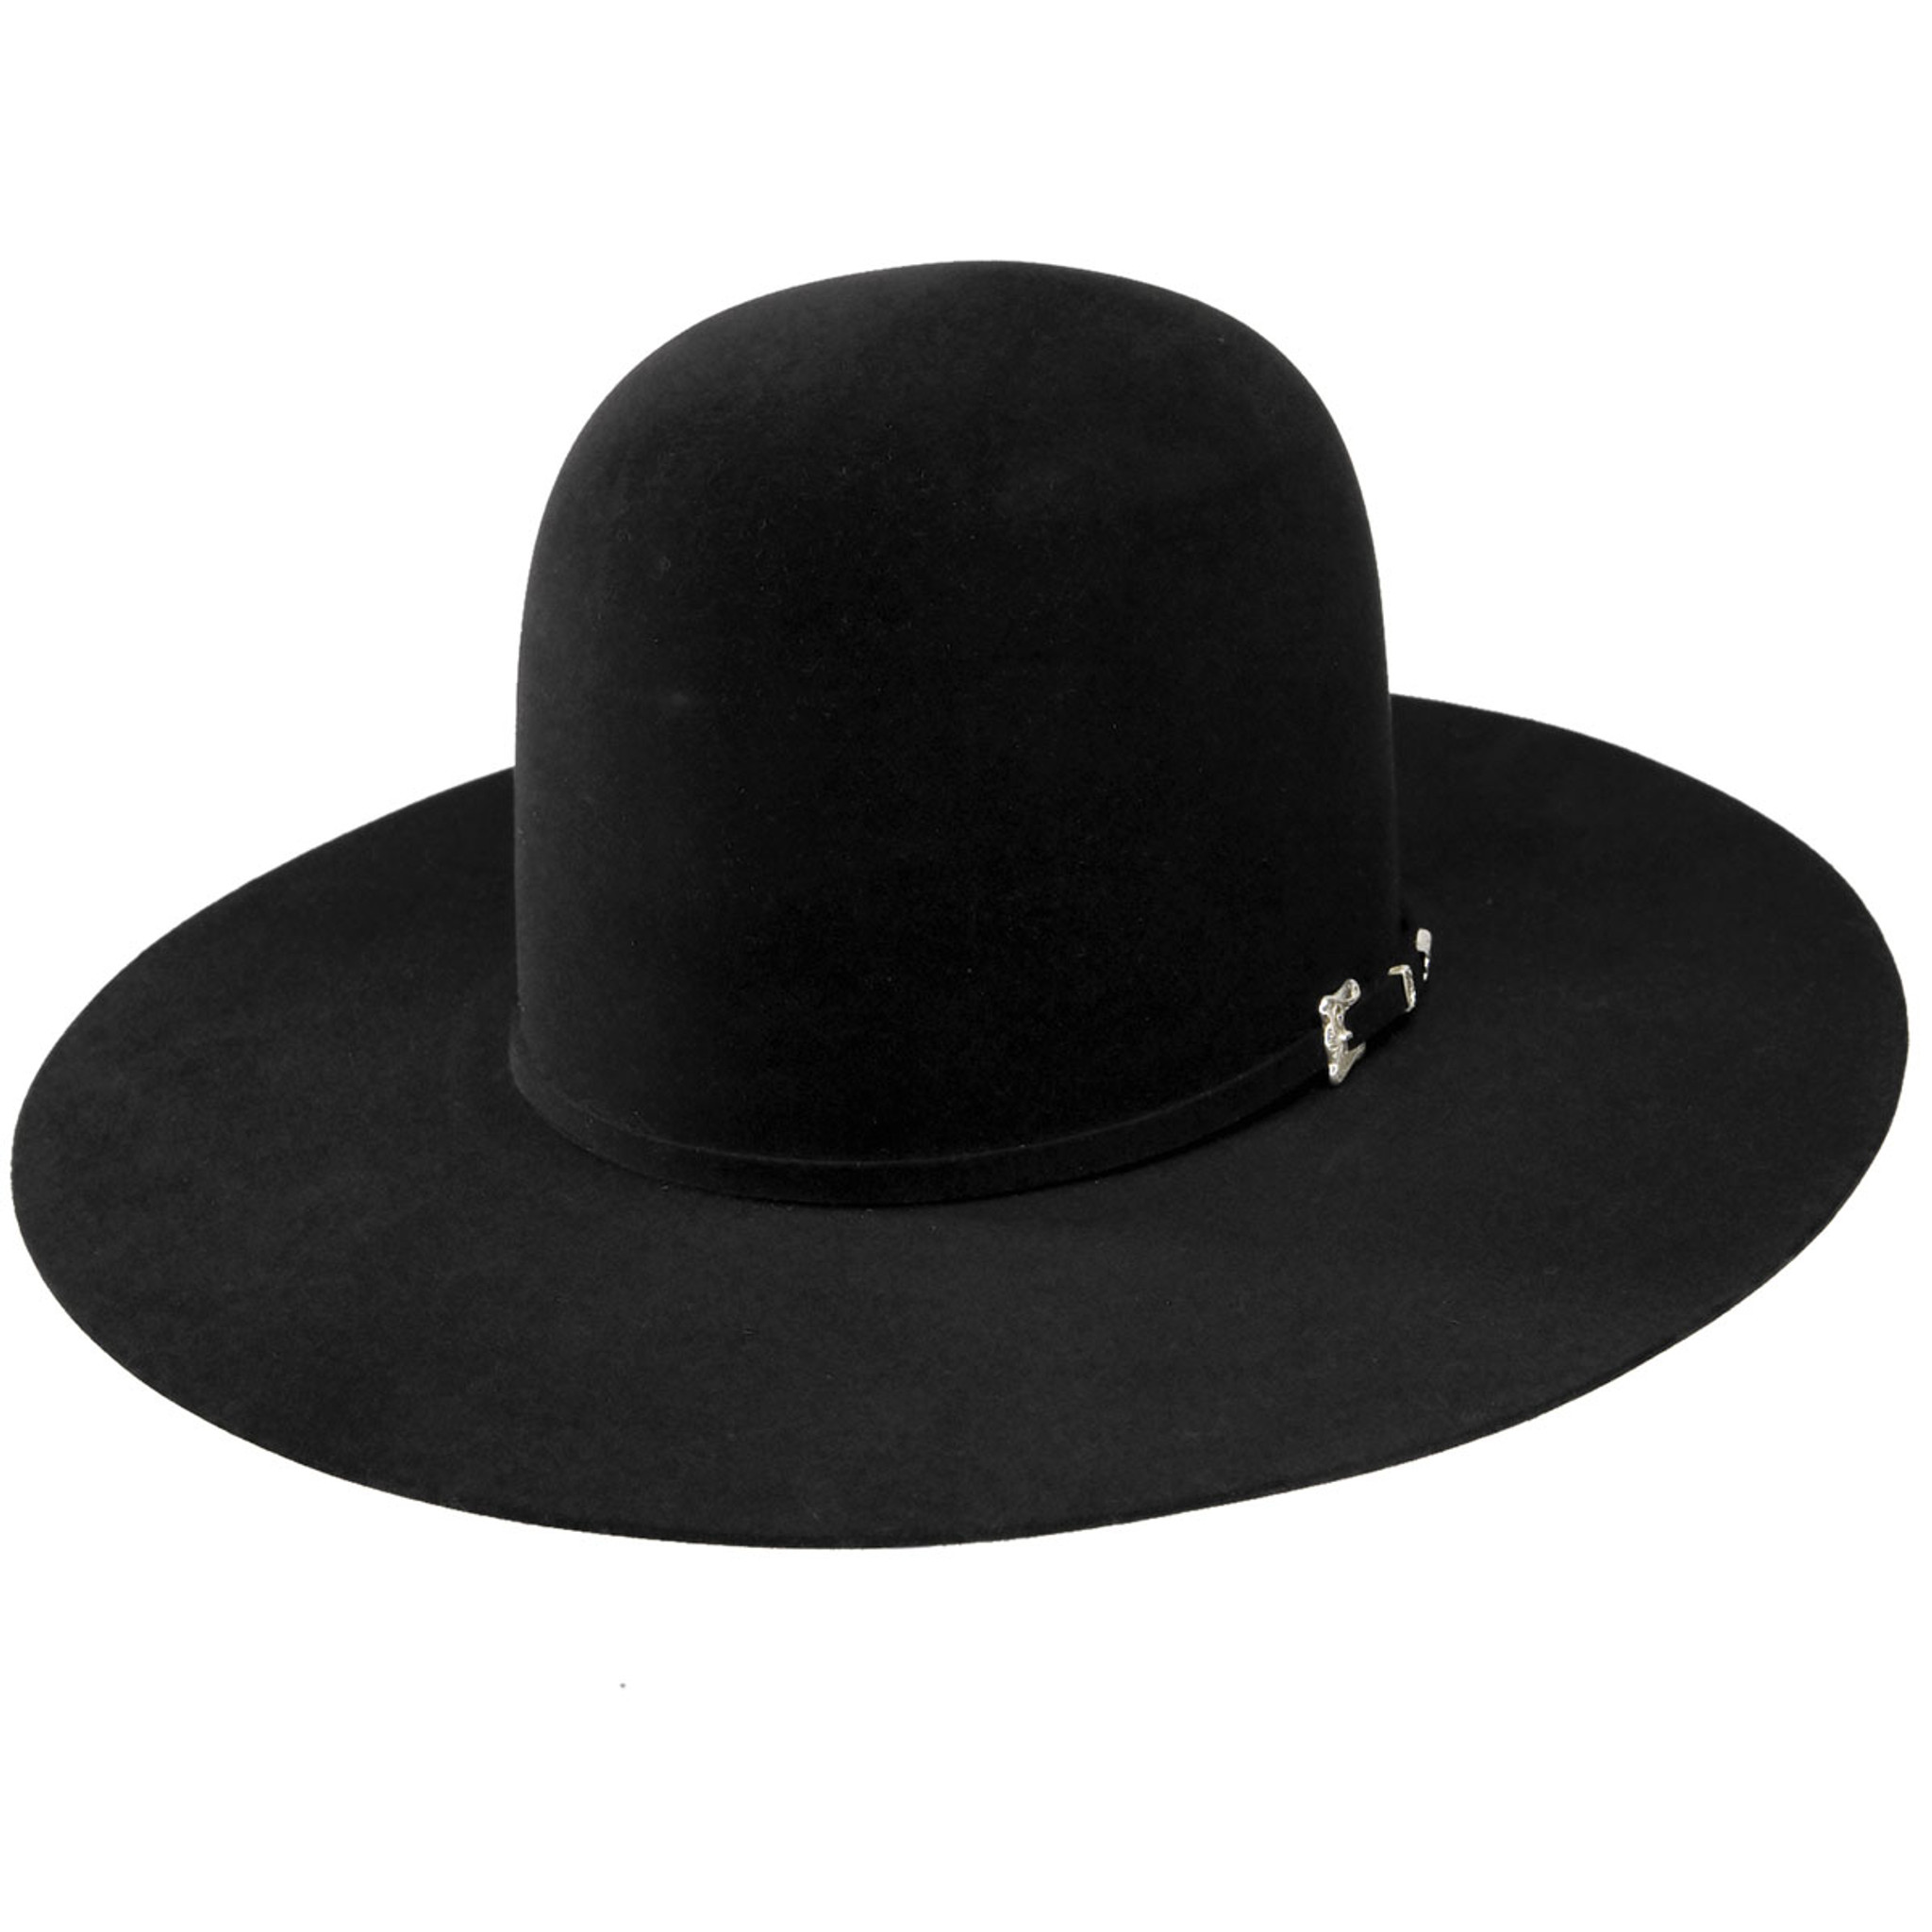 Resistol Felt Hat 2f5f575daad1